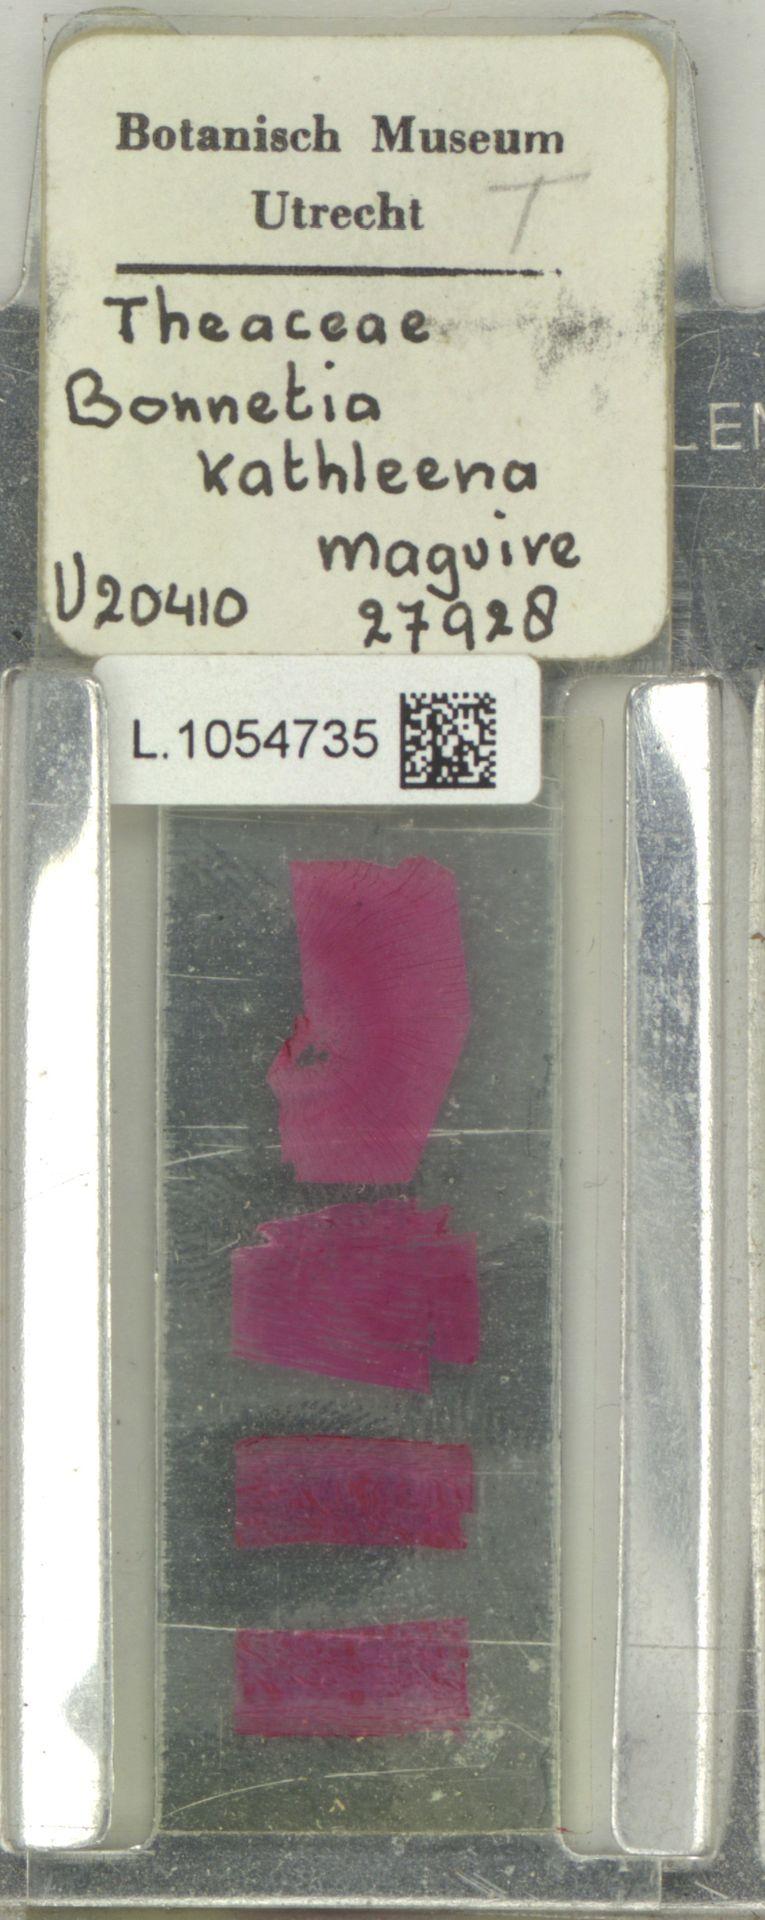 L.1054735 | Bonnetia kathleenae Lasser